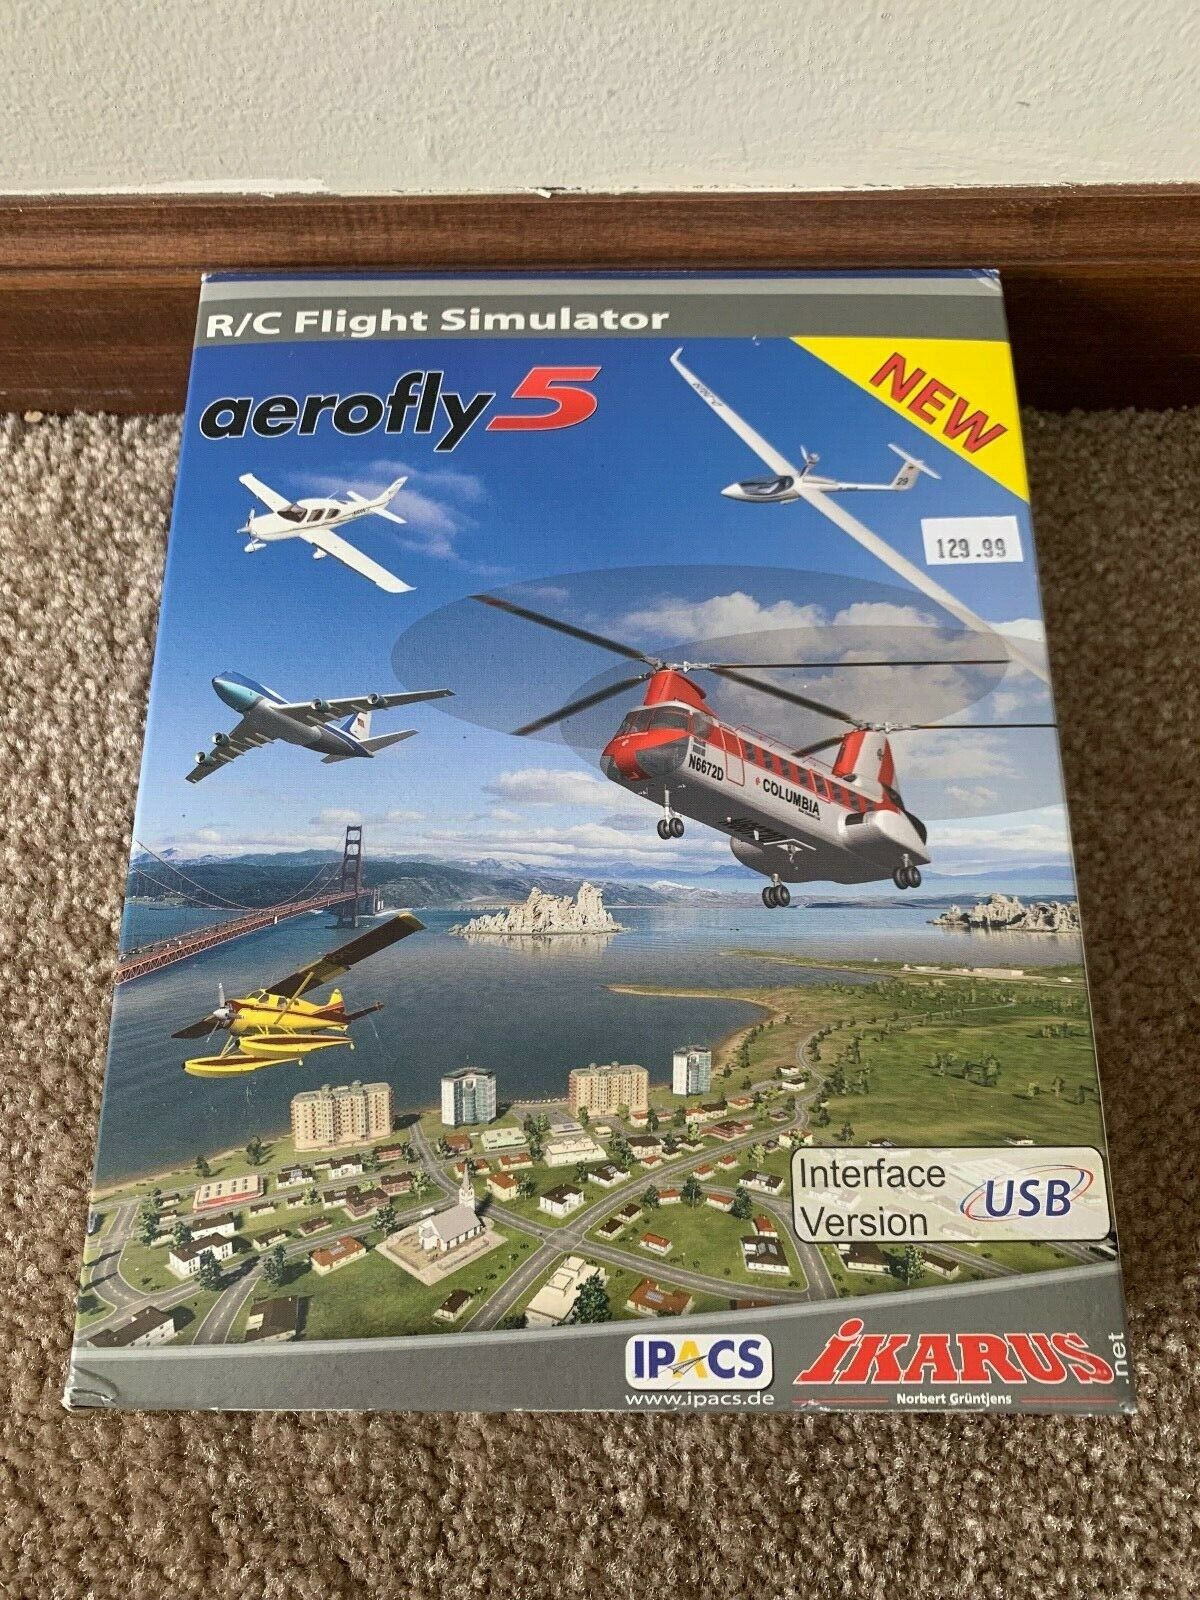 nuovo  Ikarus Aerofly 5 volo Simulator for Windows USB-Interface Version  fabbrica diretta